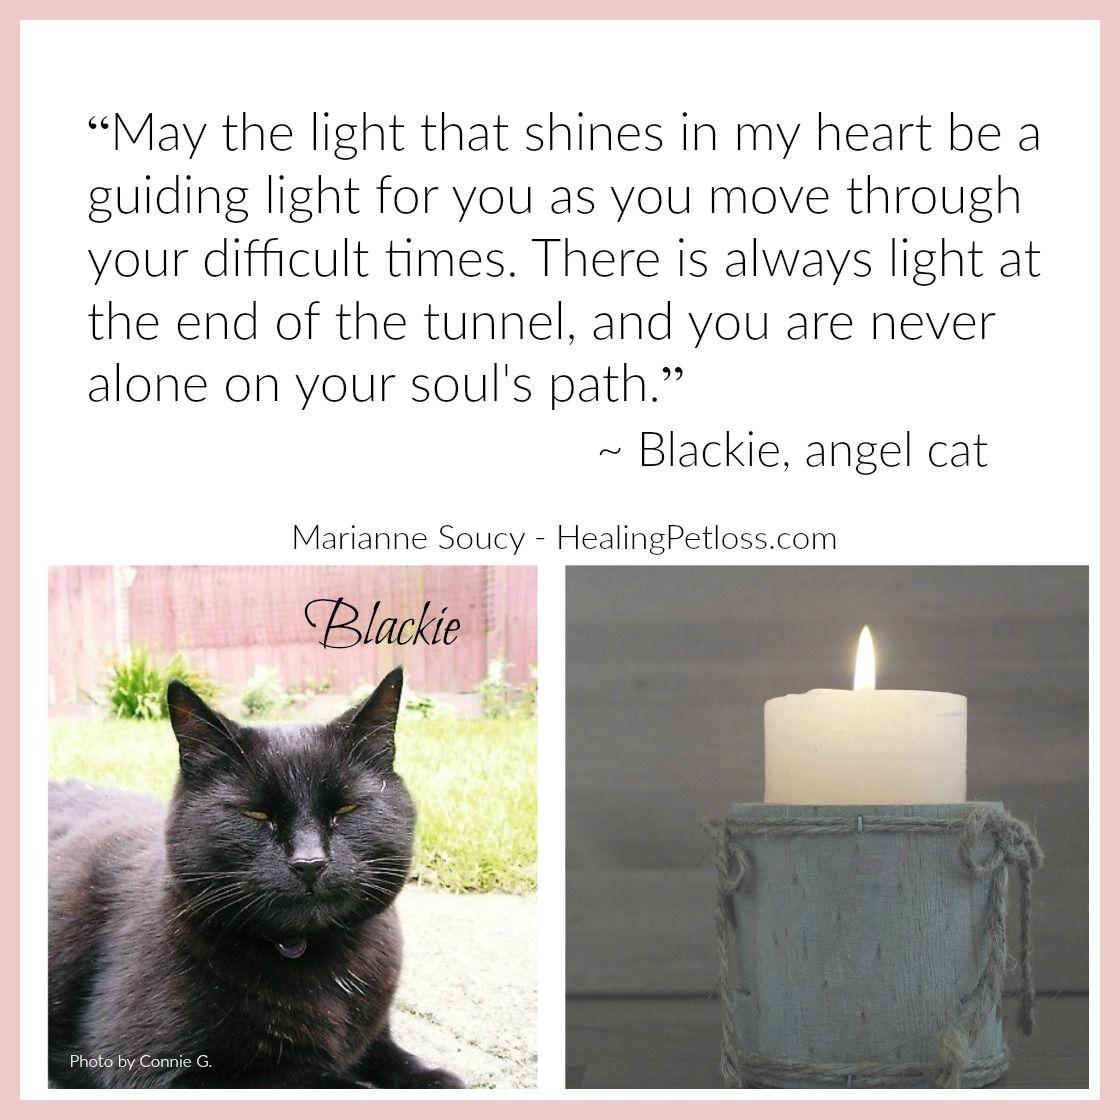 Pin by Healing Pet Loss on Healing Pet Loss Podcast | Pet